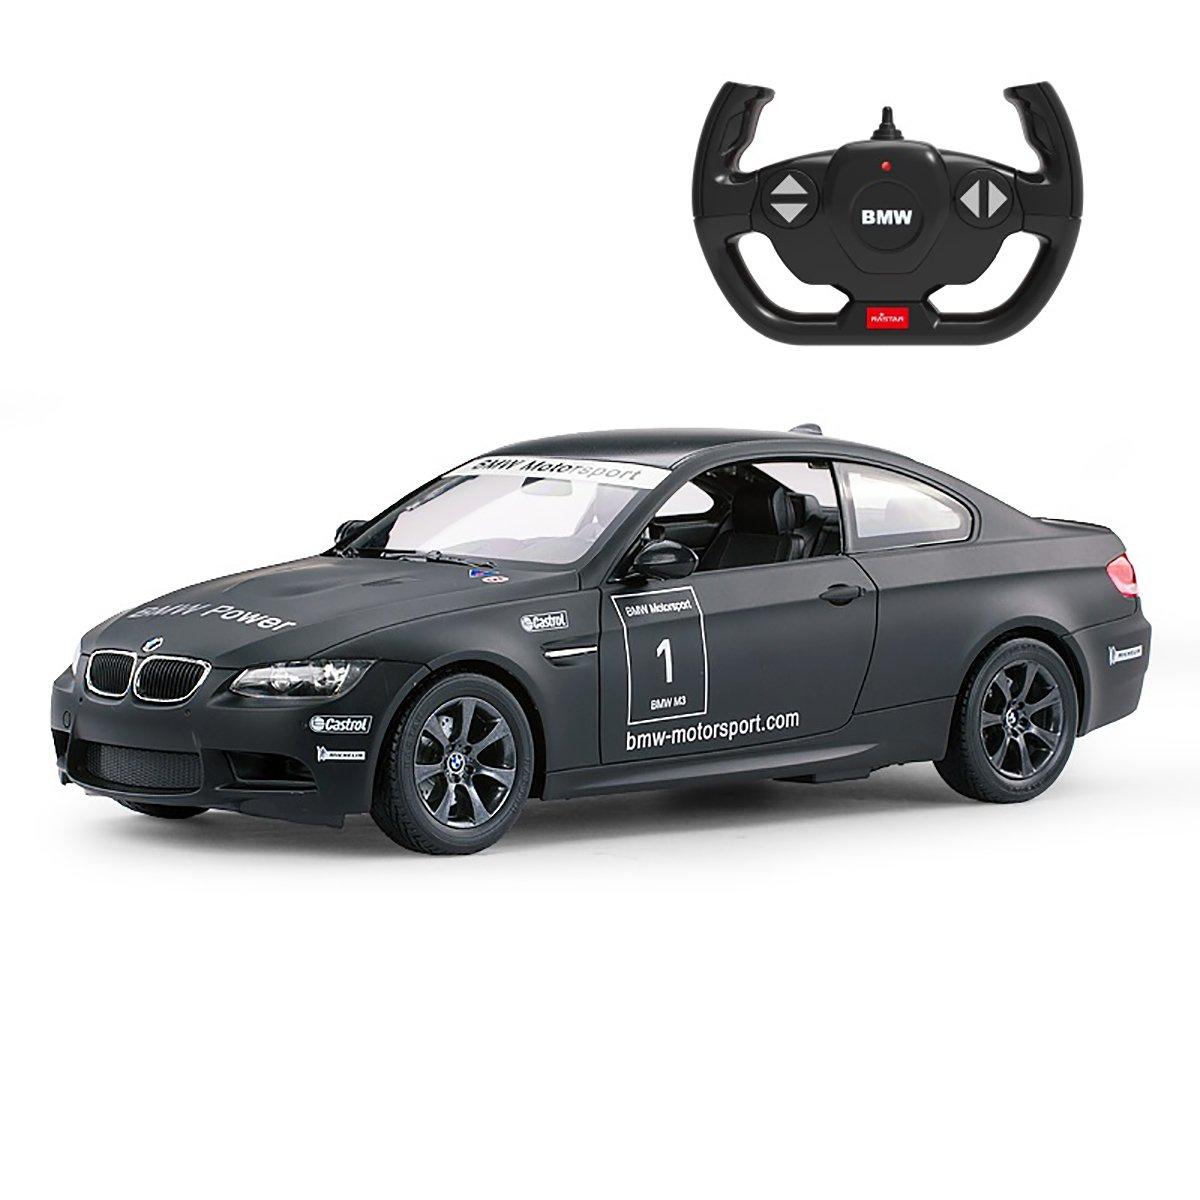 Masinuta cu telecomanda Rastar BMW M3, Negru, 1:14